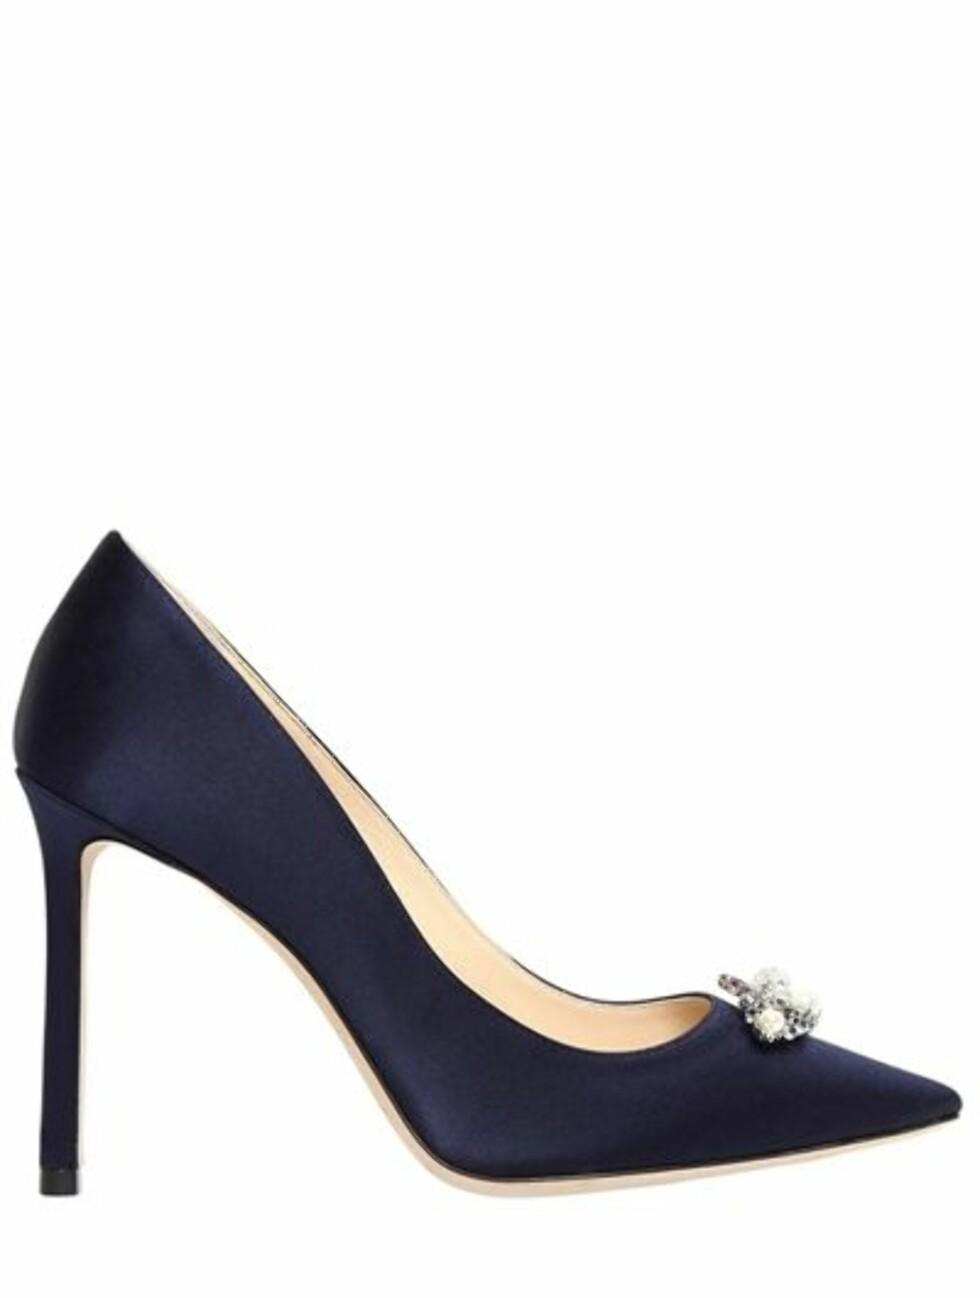 Sko fra Jimmy Choo |3025,-| https://www.matchesfashion.com/intl/products/Jimmy-Choo-Alexa-100mm-crystal-embellished-satin-shoes-1148483